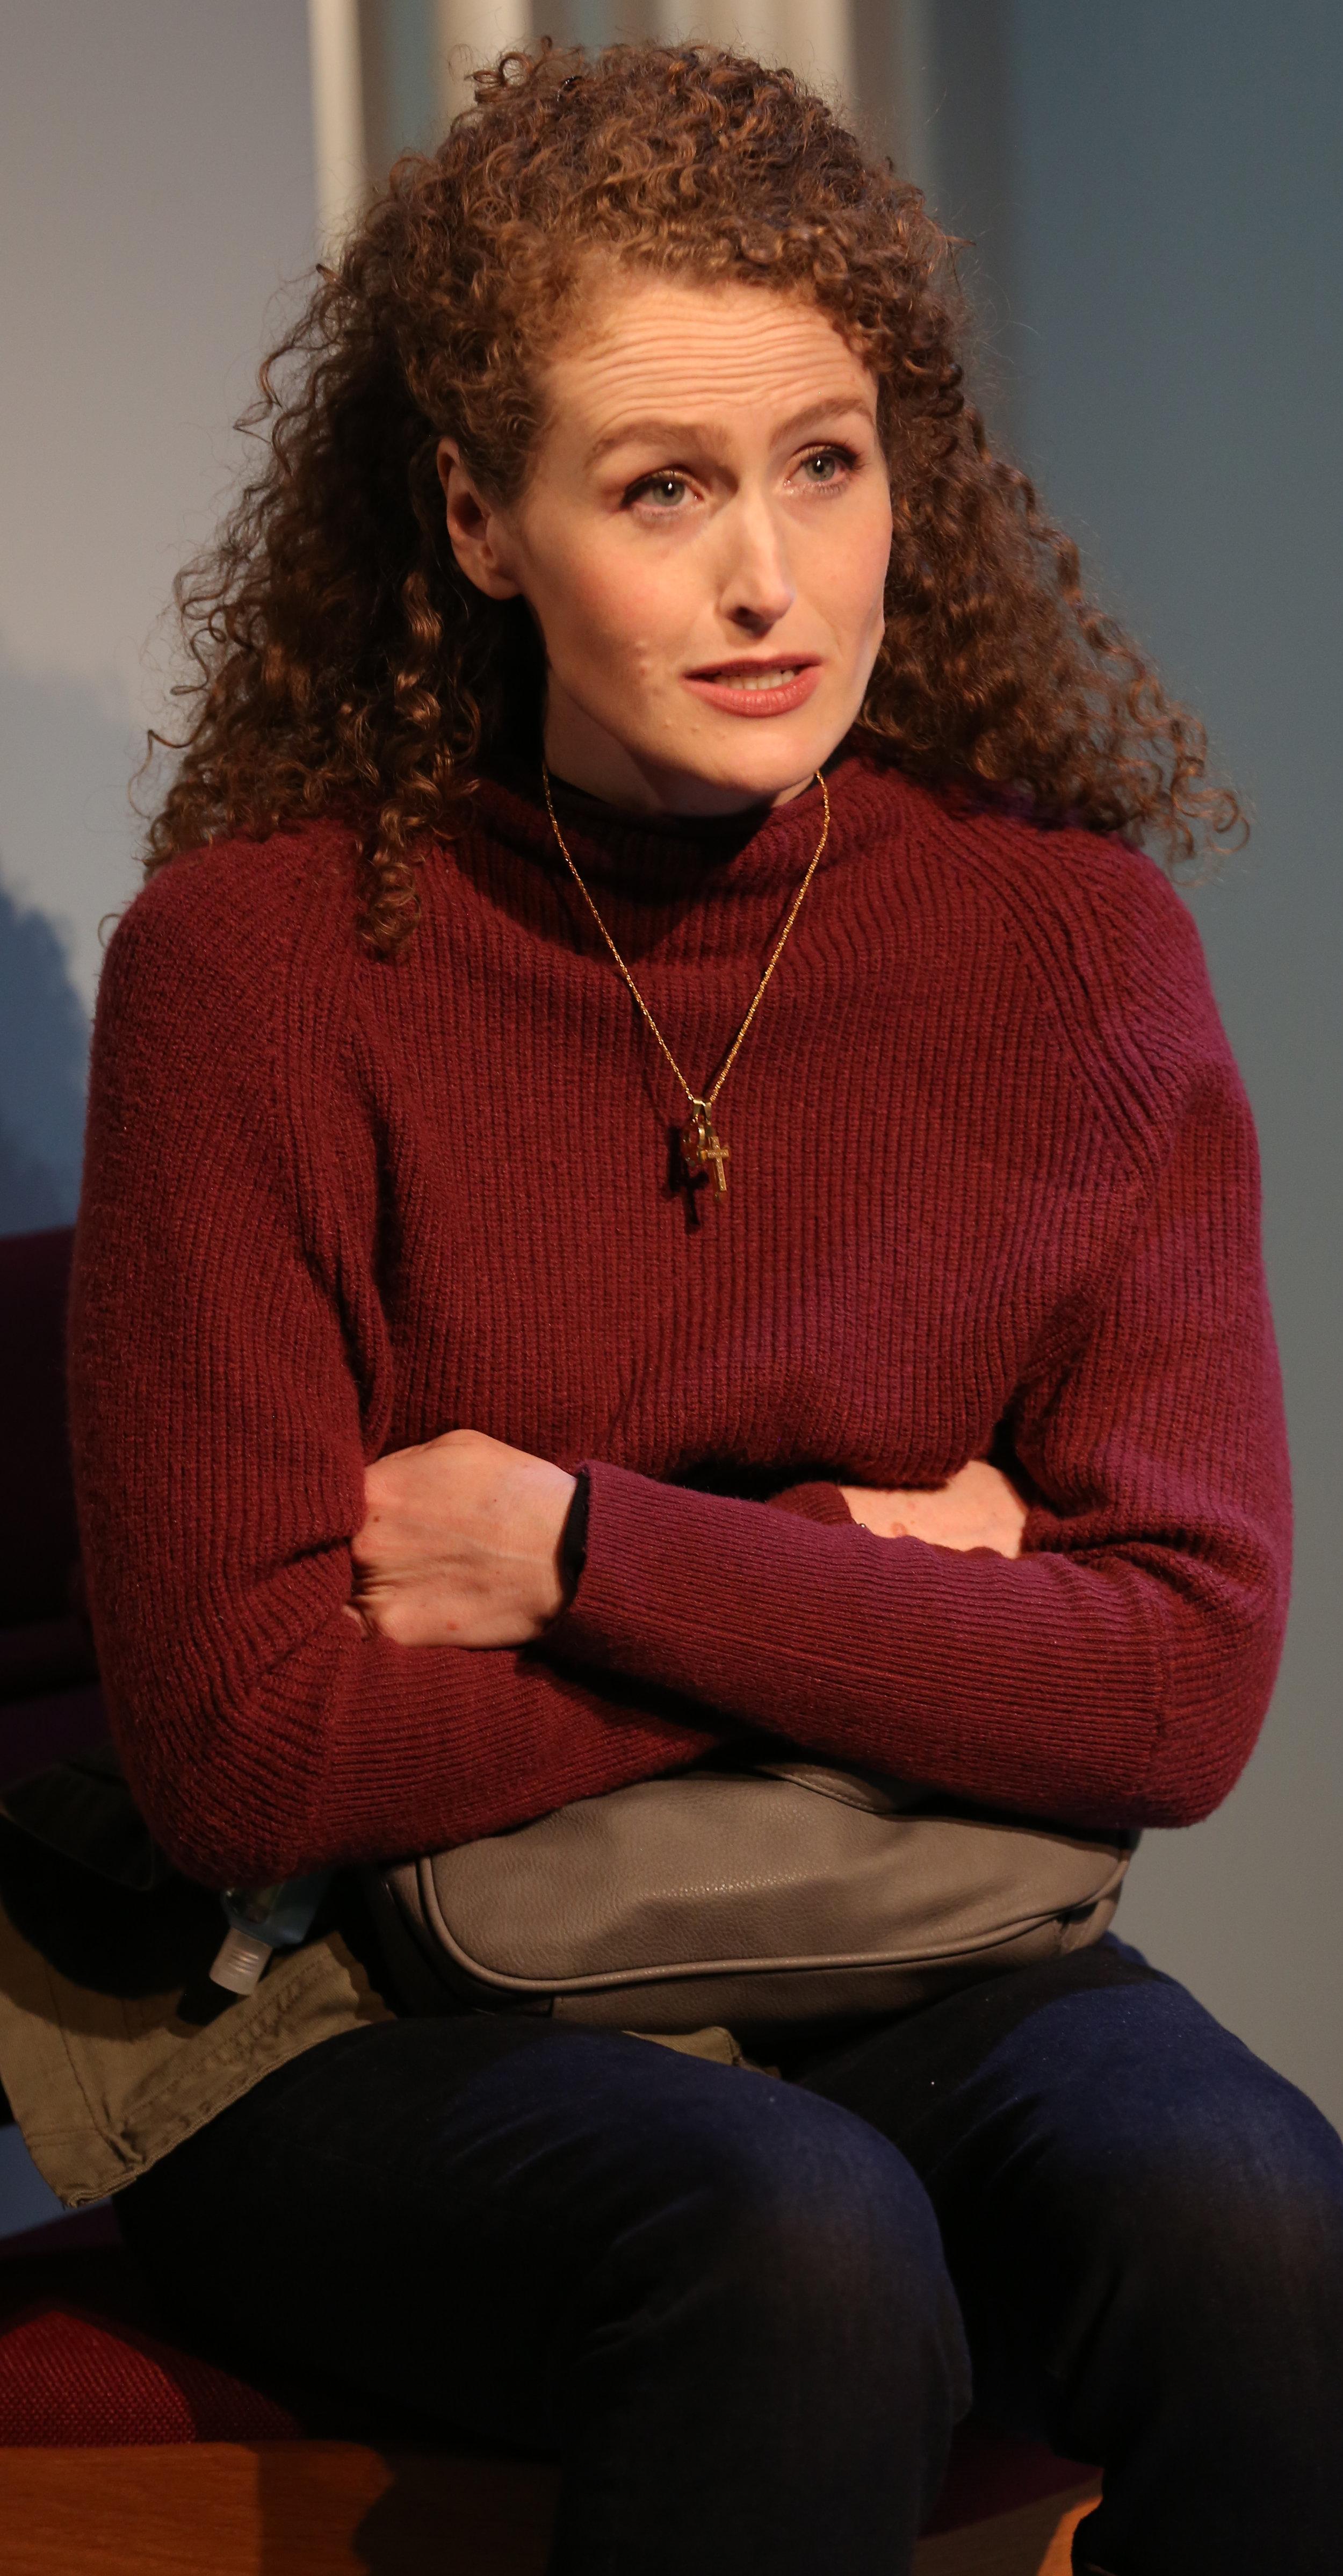 Brenda Meaney plays Lorraine.